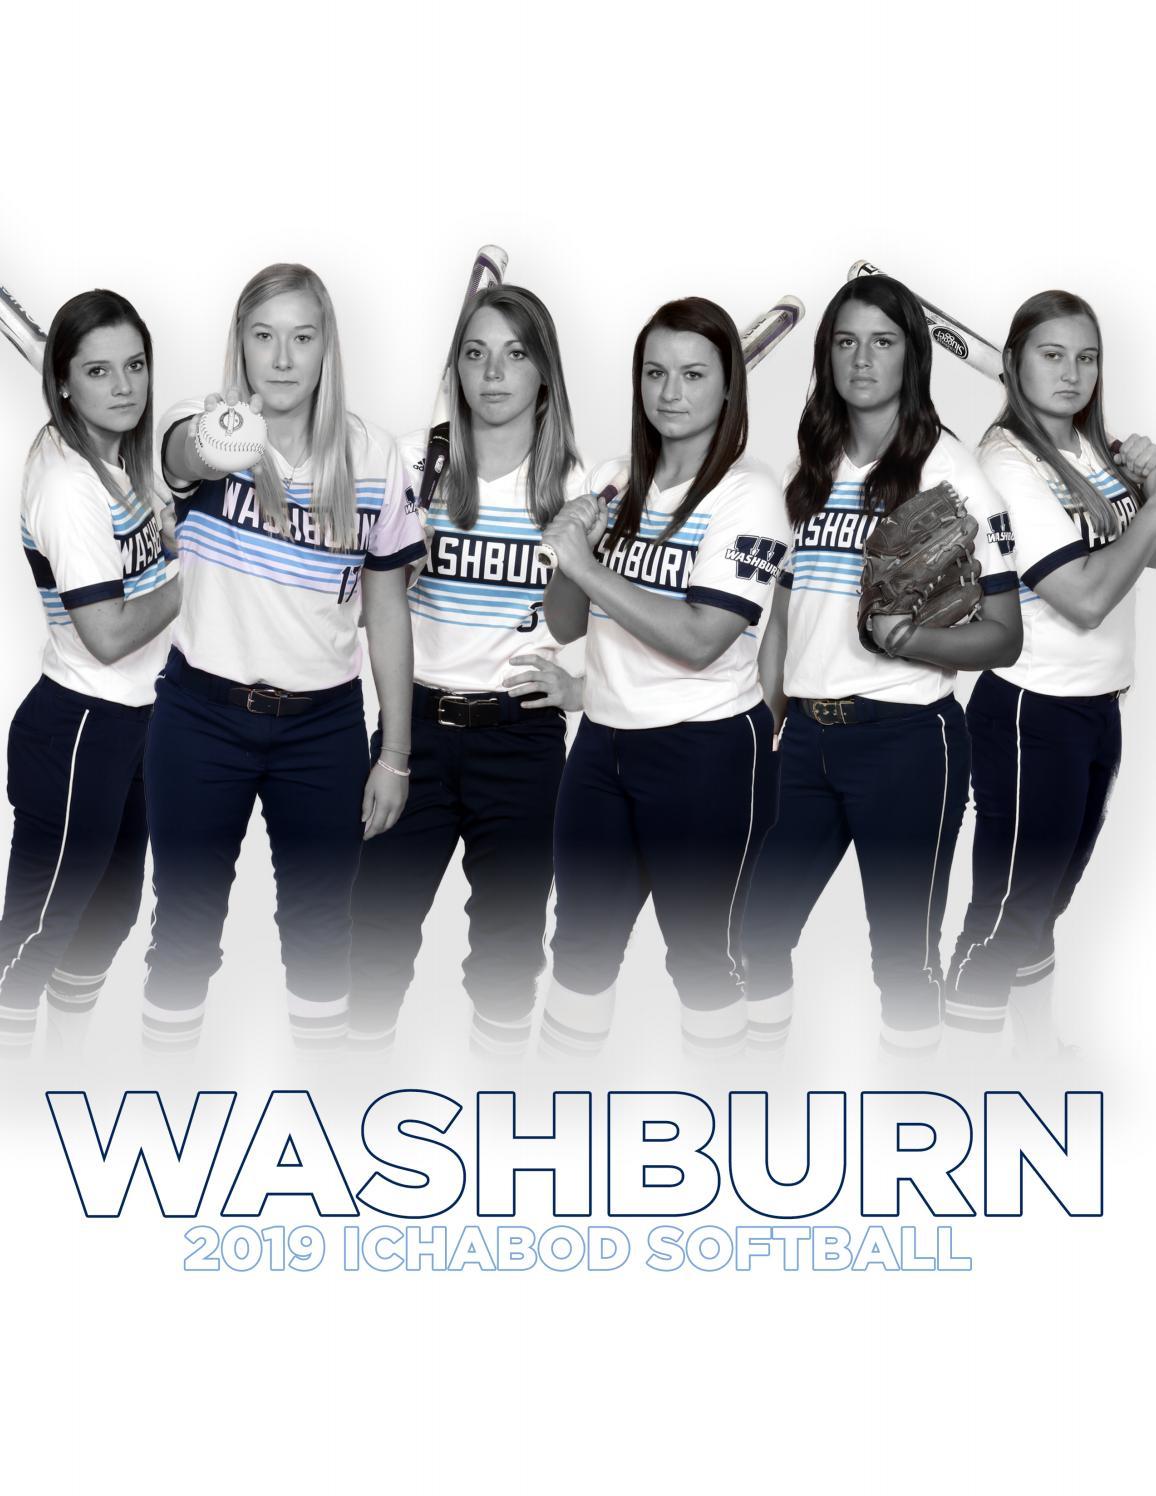 2019 Washburn Ichabod softball media guide by Washburn